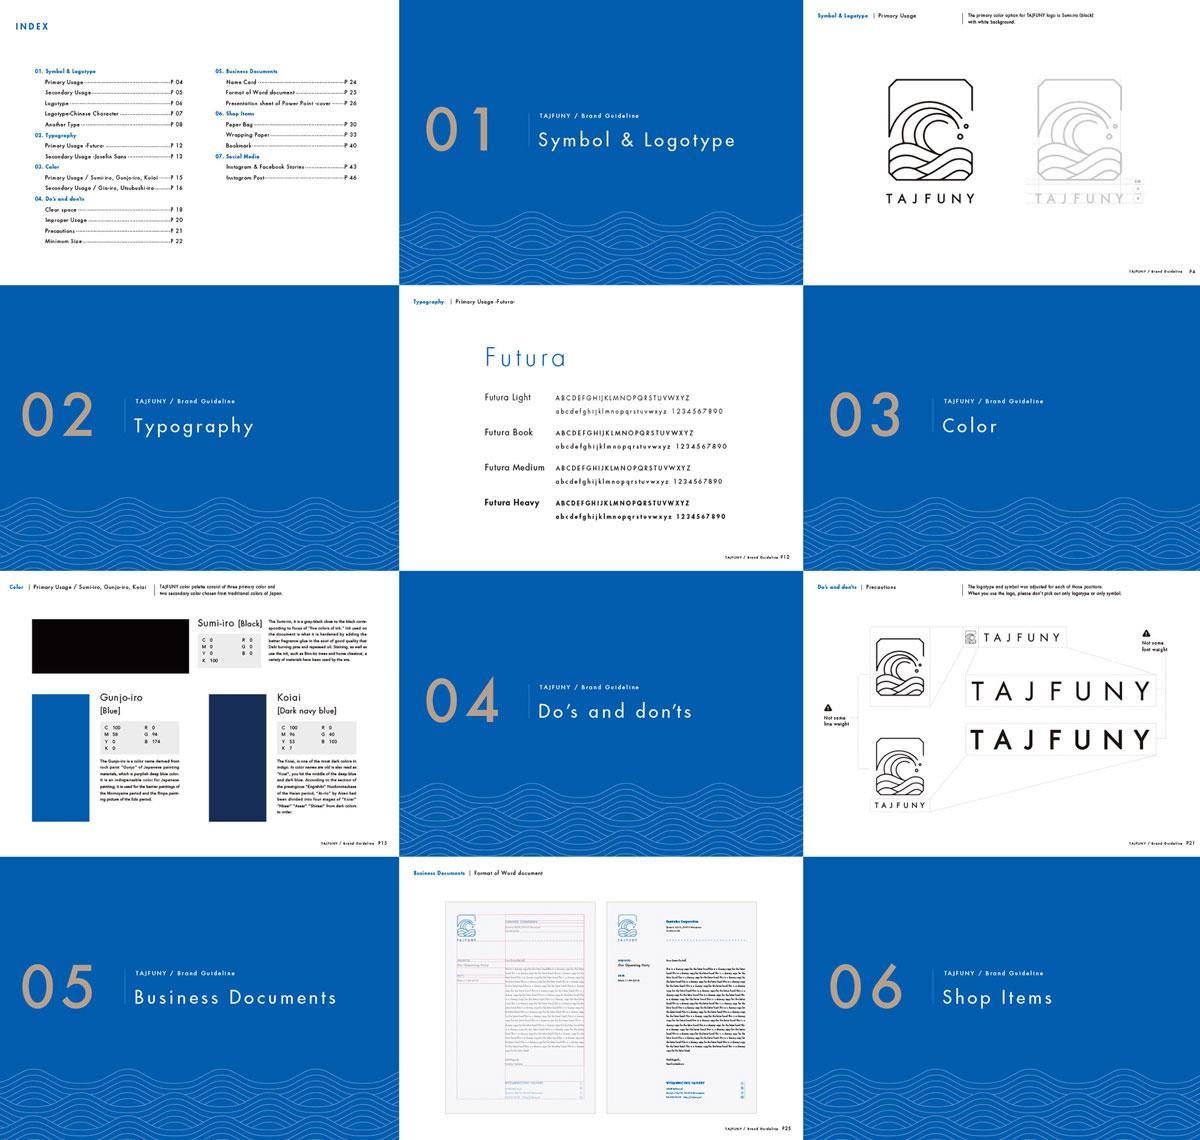 Futura Font Foes Japan in a Branding Design Project for TAJFUNY